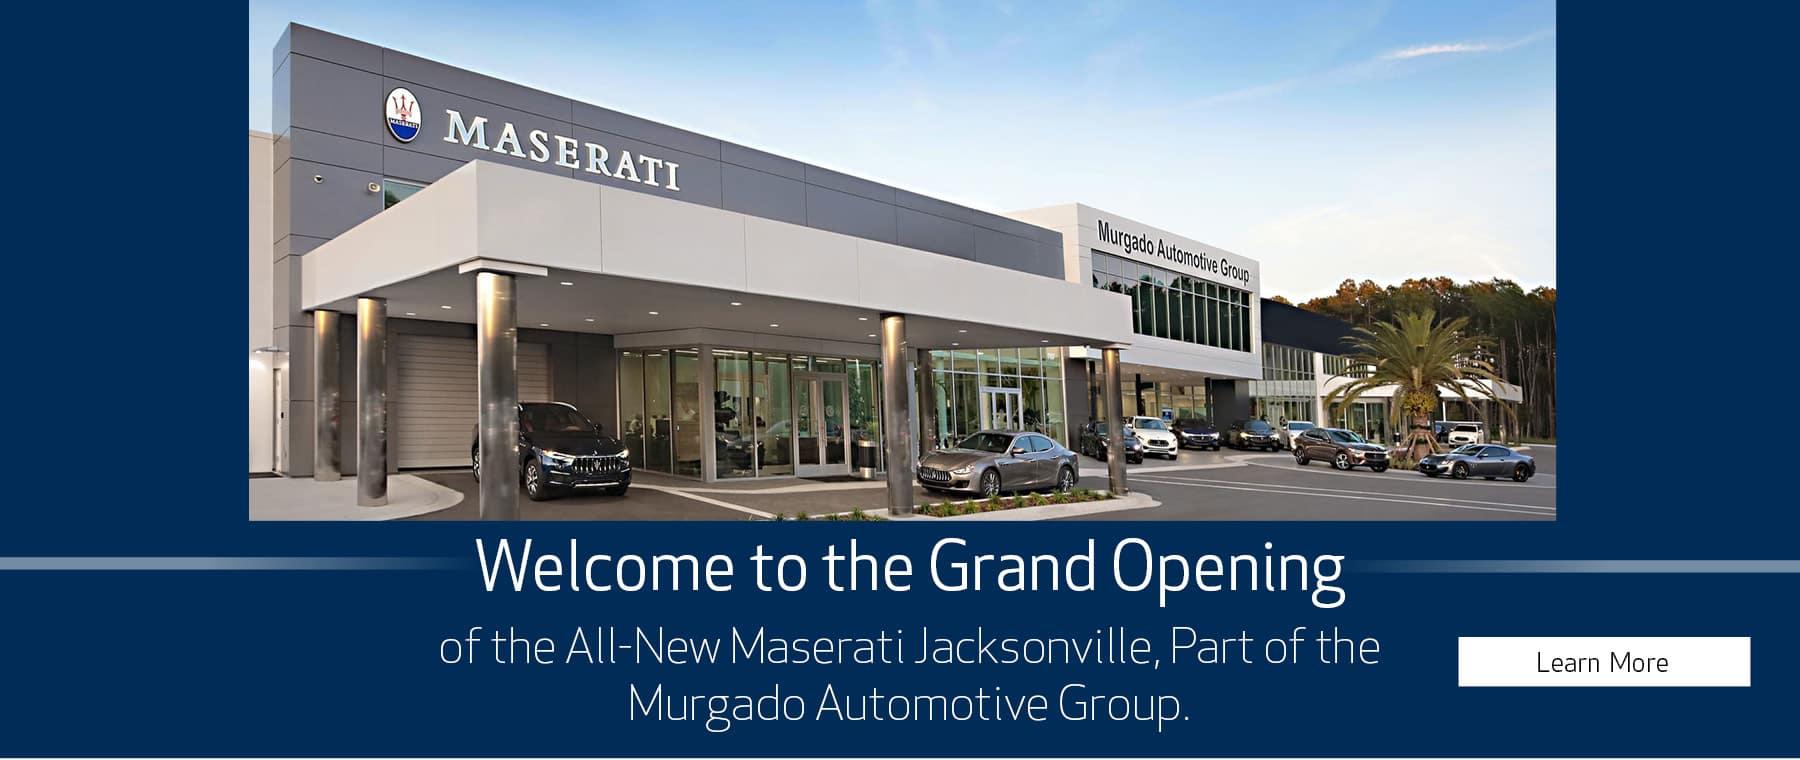 All New Maserati Jacksonville storefront